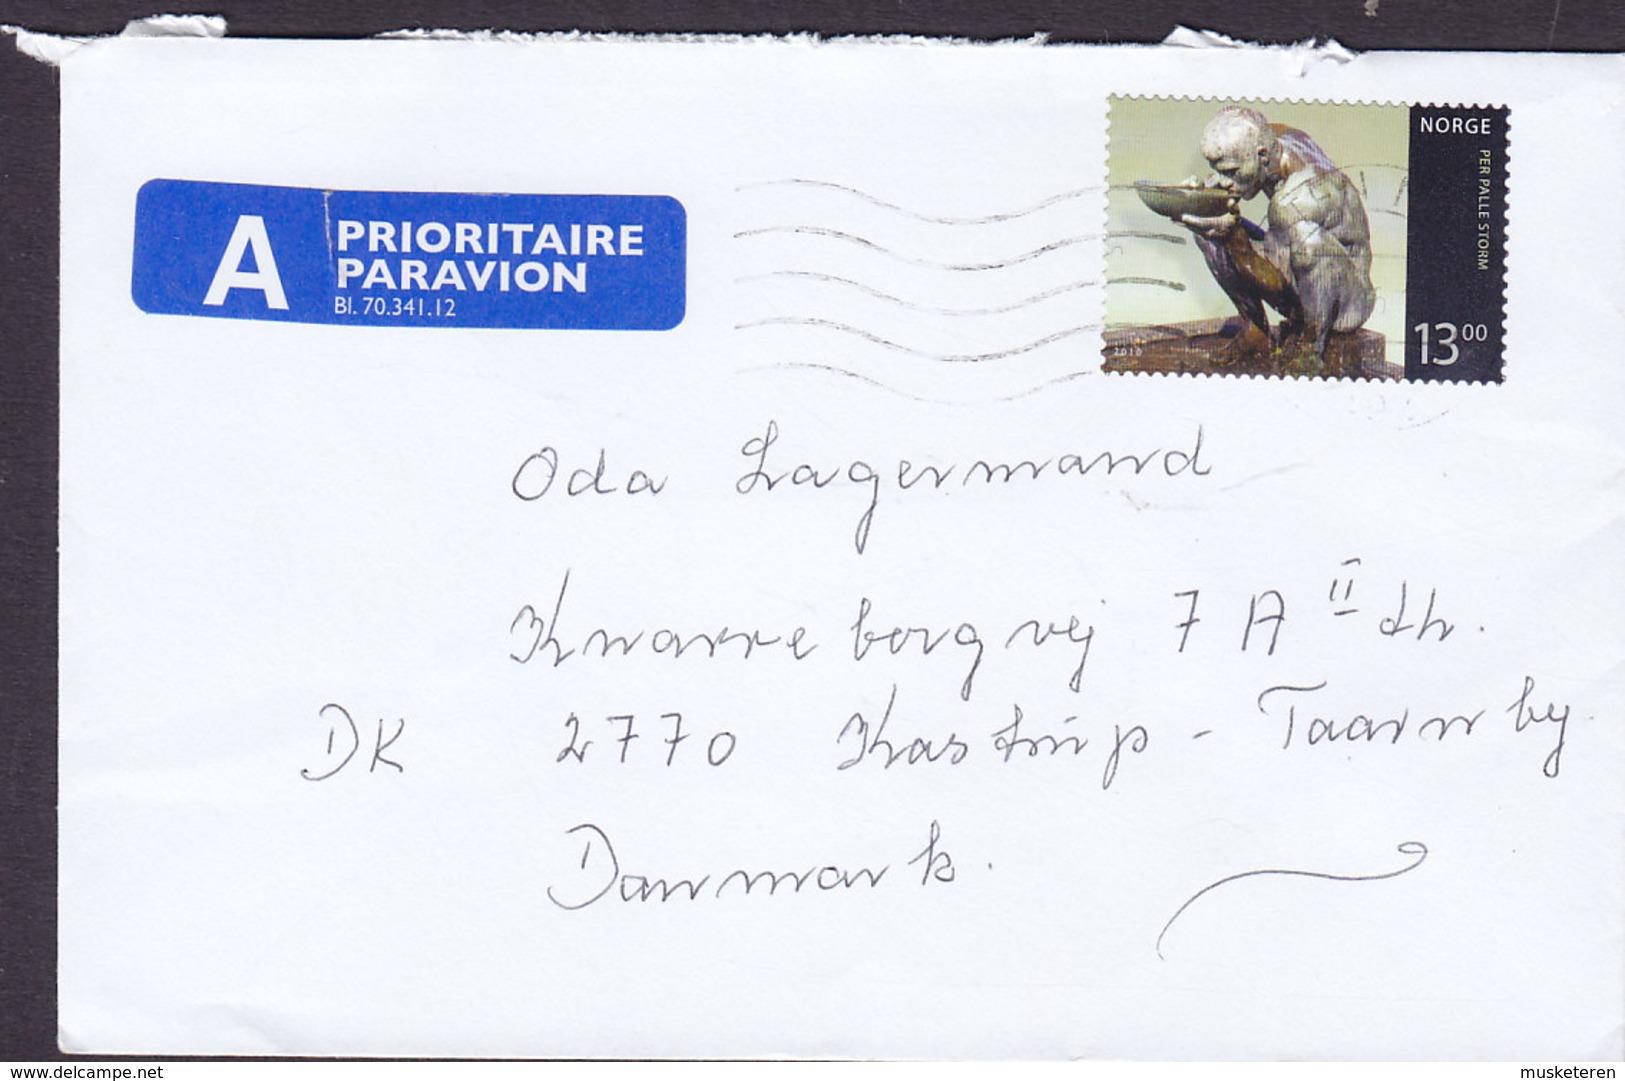 Norway A PRIORITAIRE Par Avion Label 2010 Cover Brief KASTRUP TAARNBY Denmark Per Palle Storm Sculpture Stamp - Norwegen